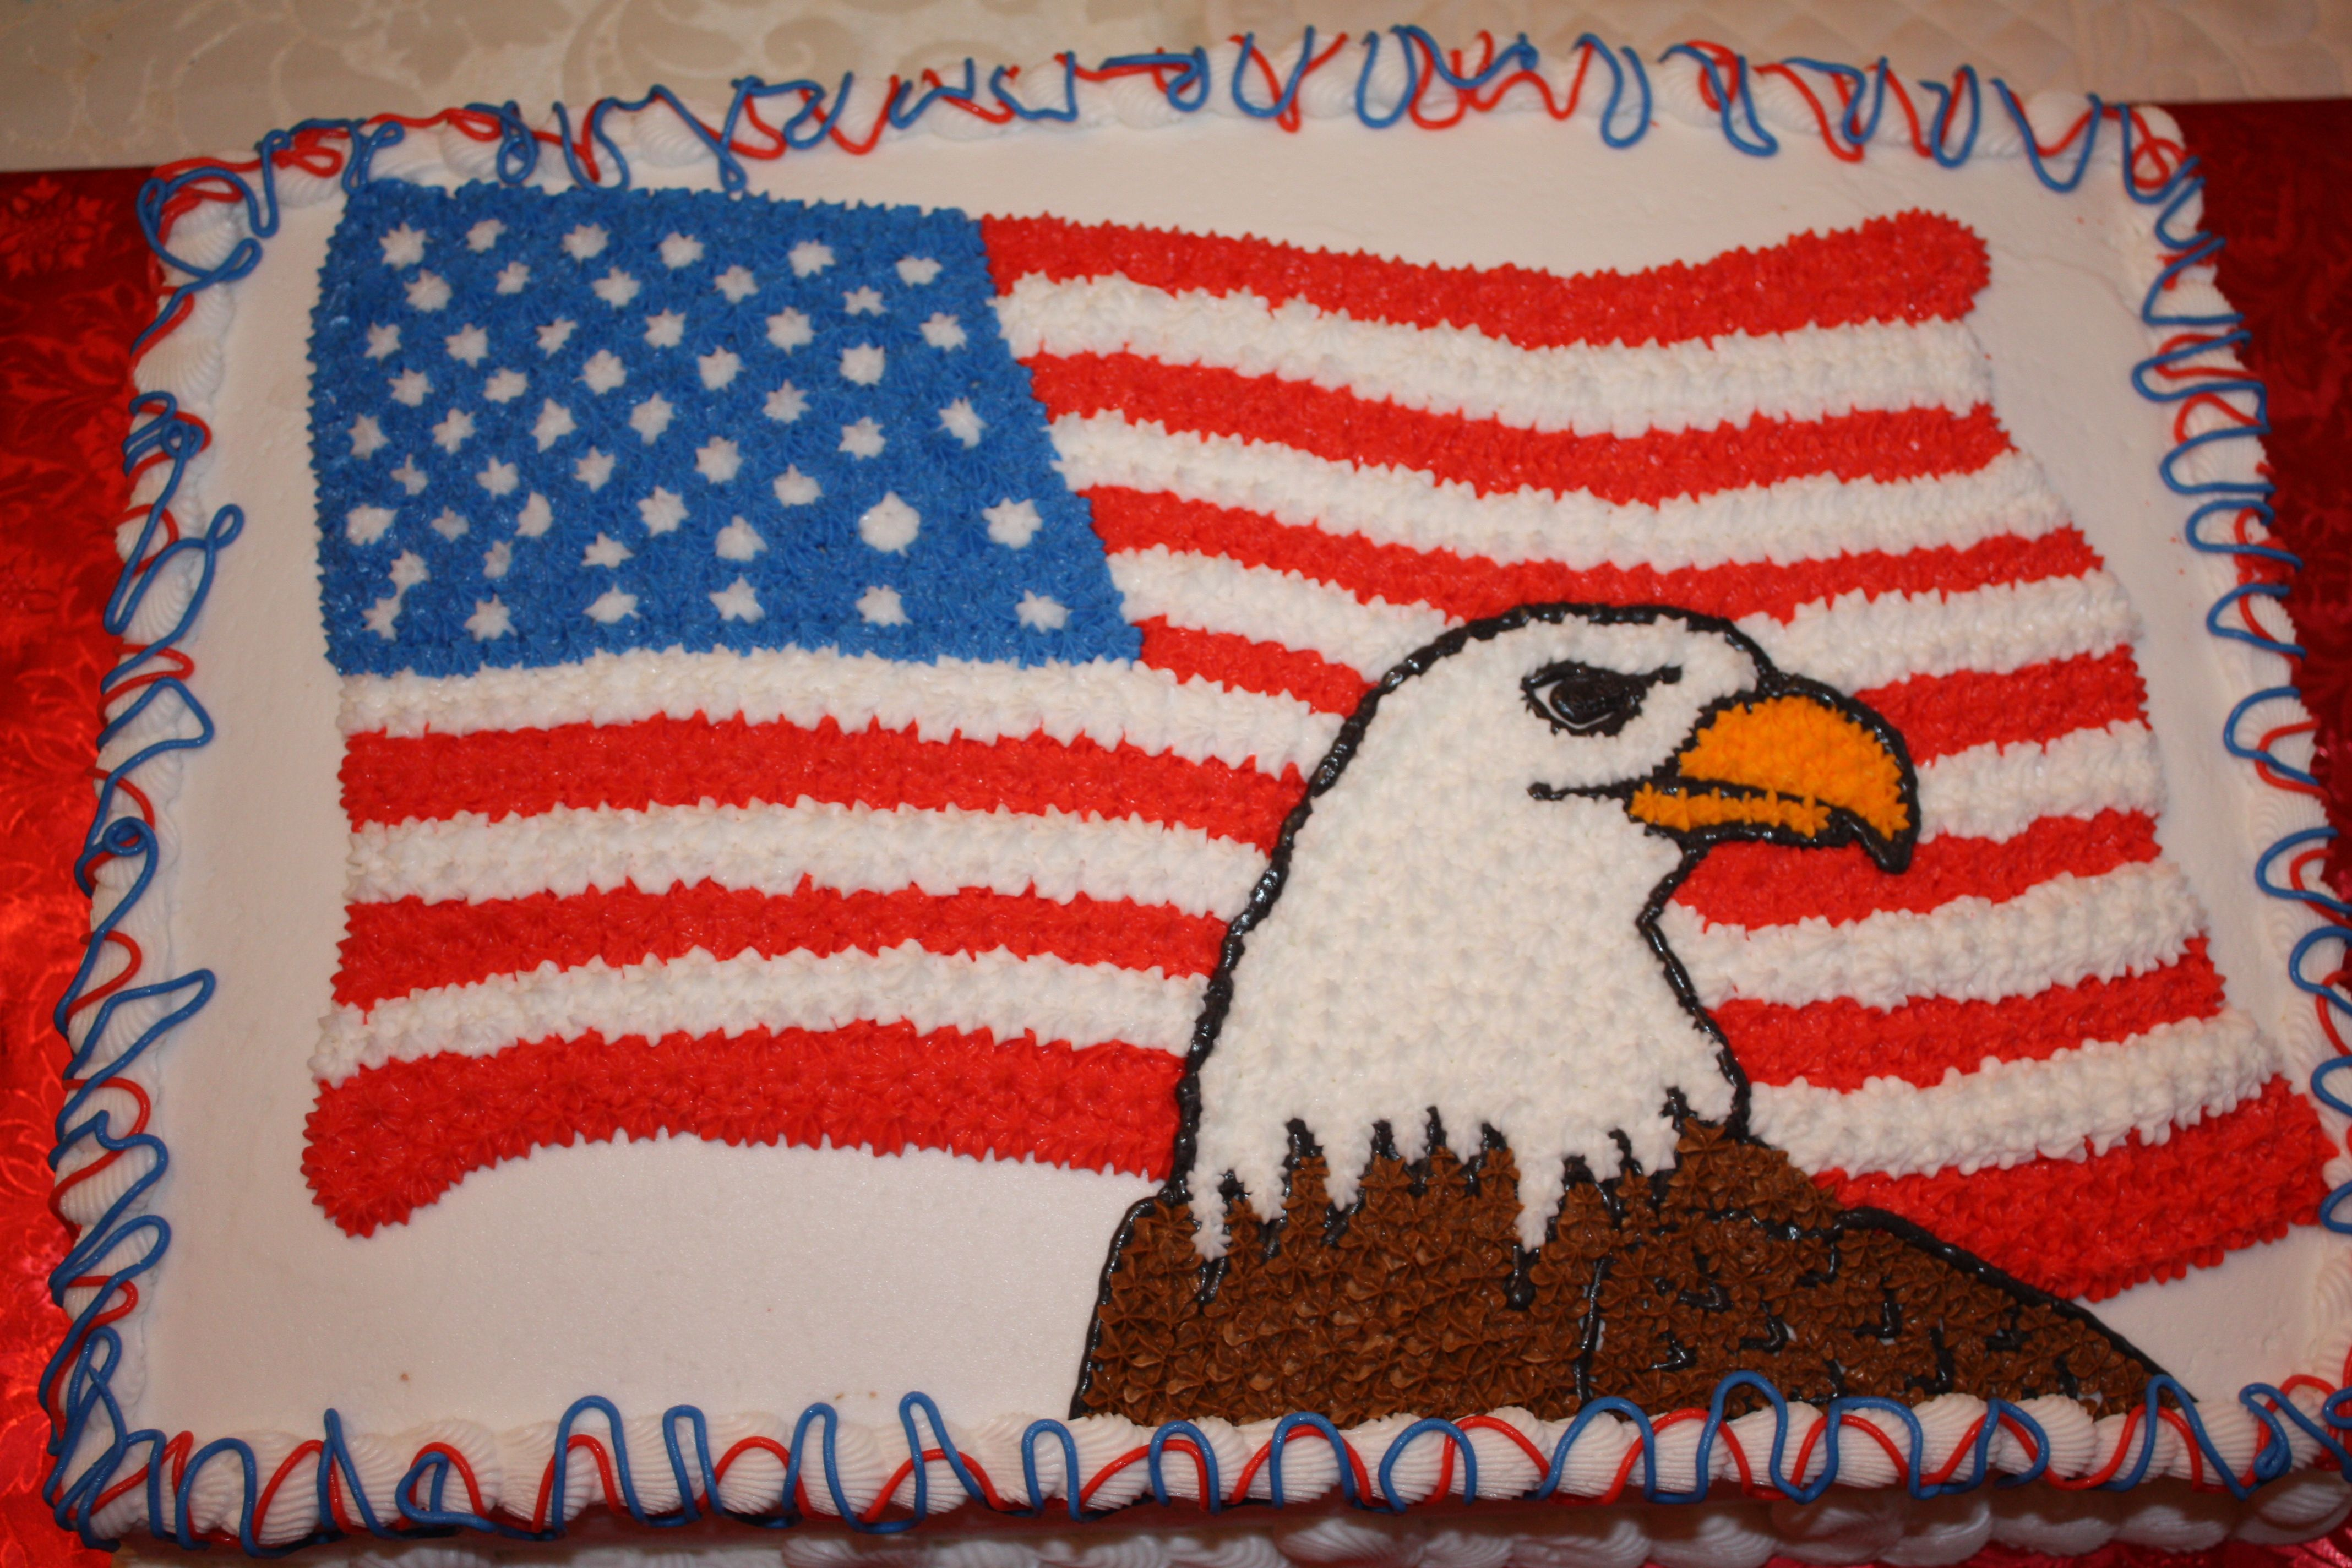 Veterans Day Cake Patriotic Cake Patriotic Cake Decorating